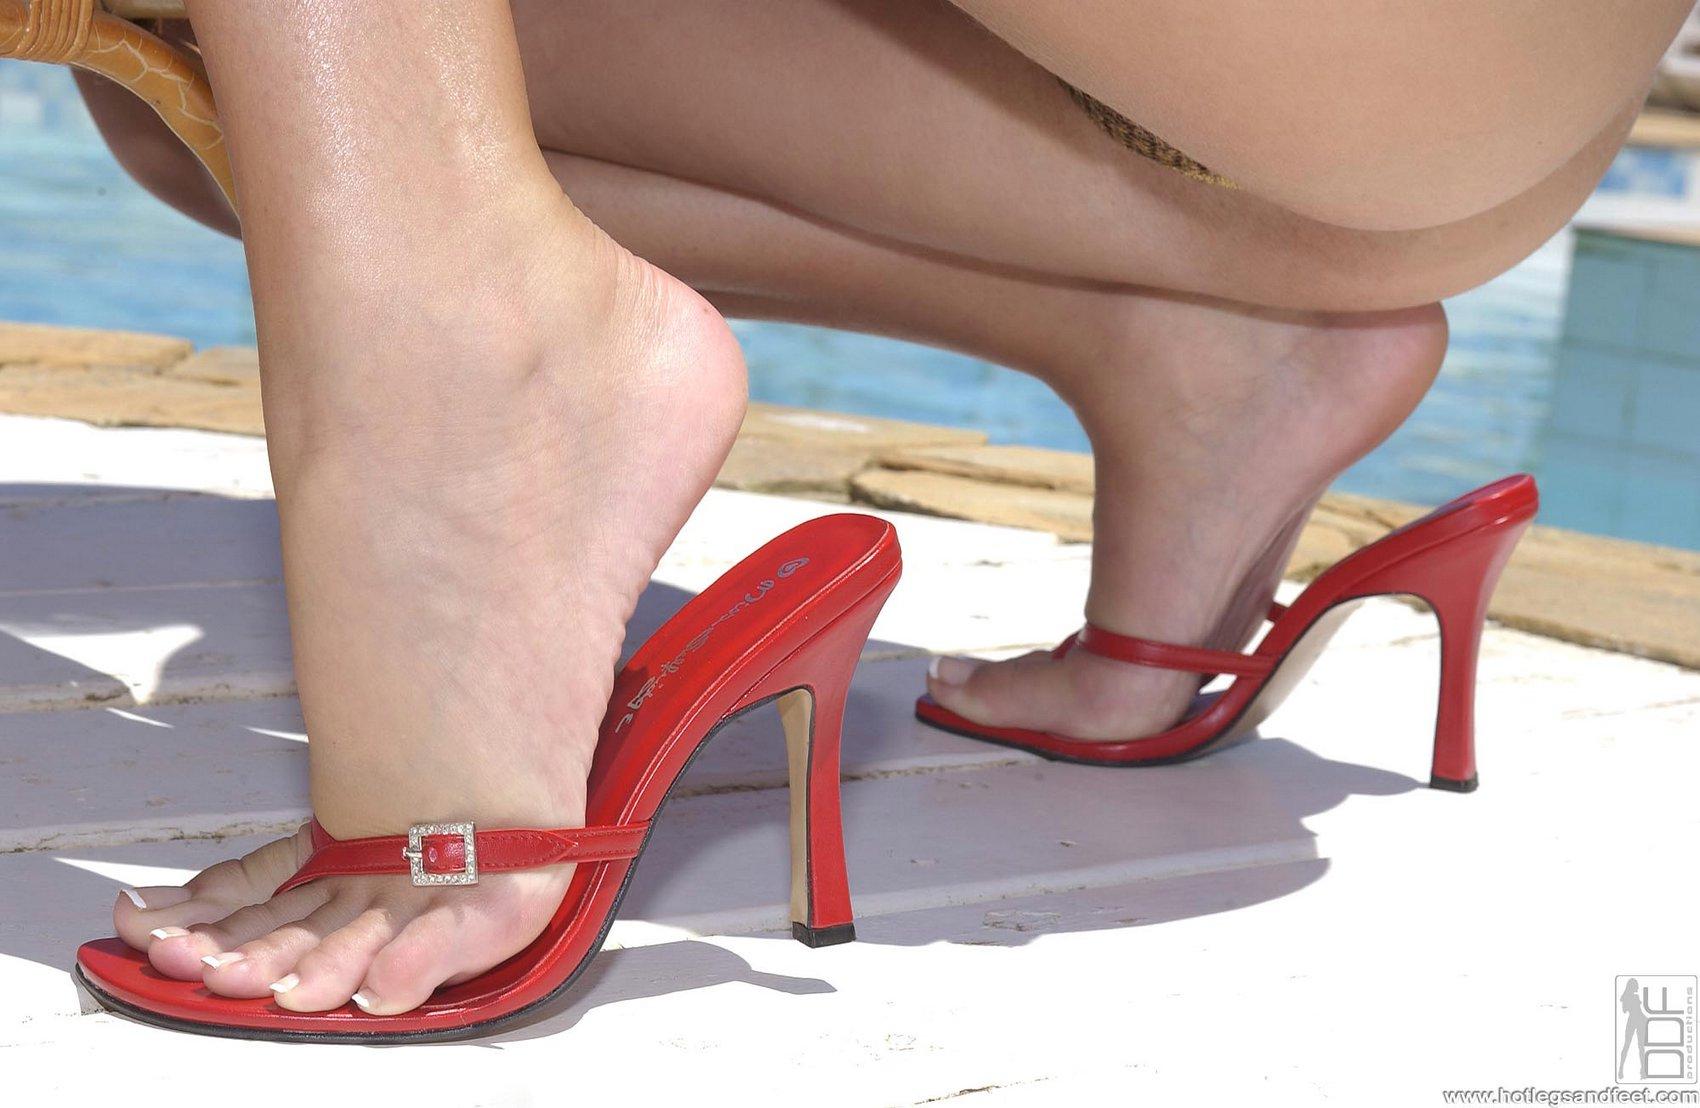 Sandra shine legs share your